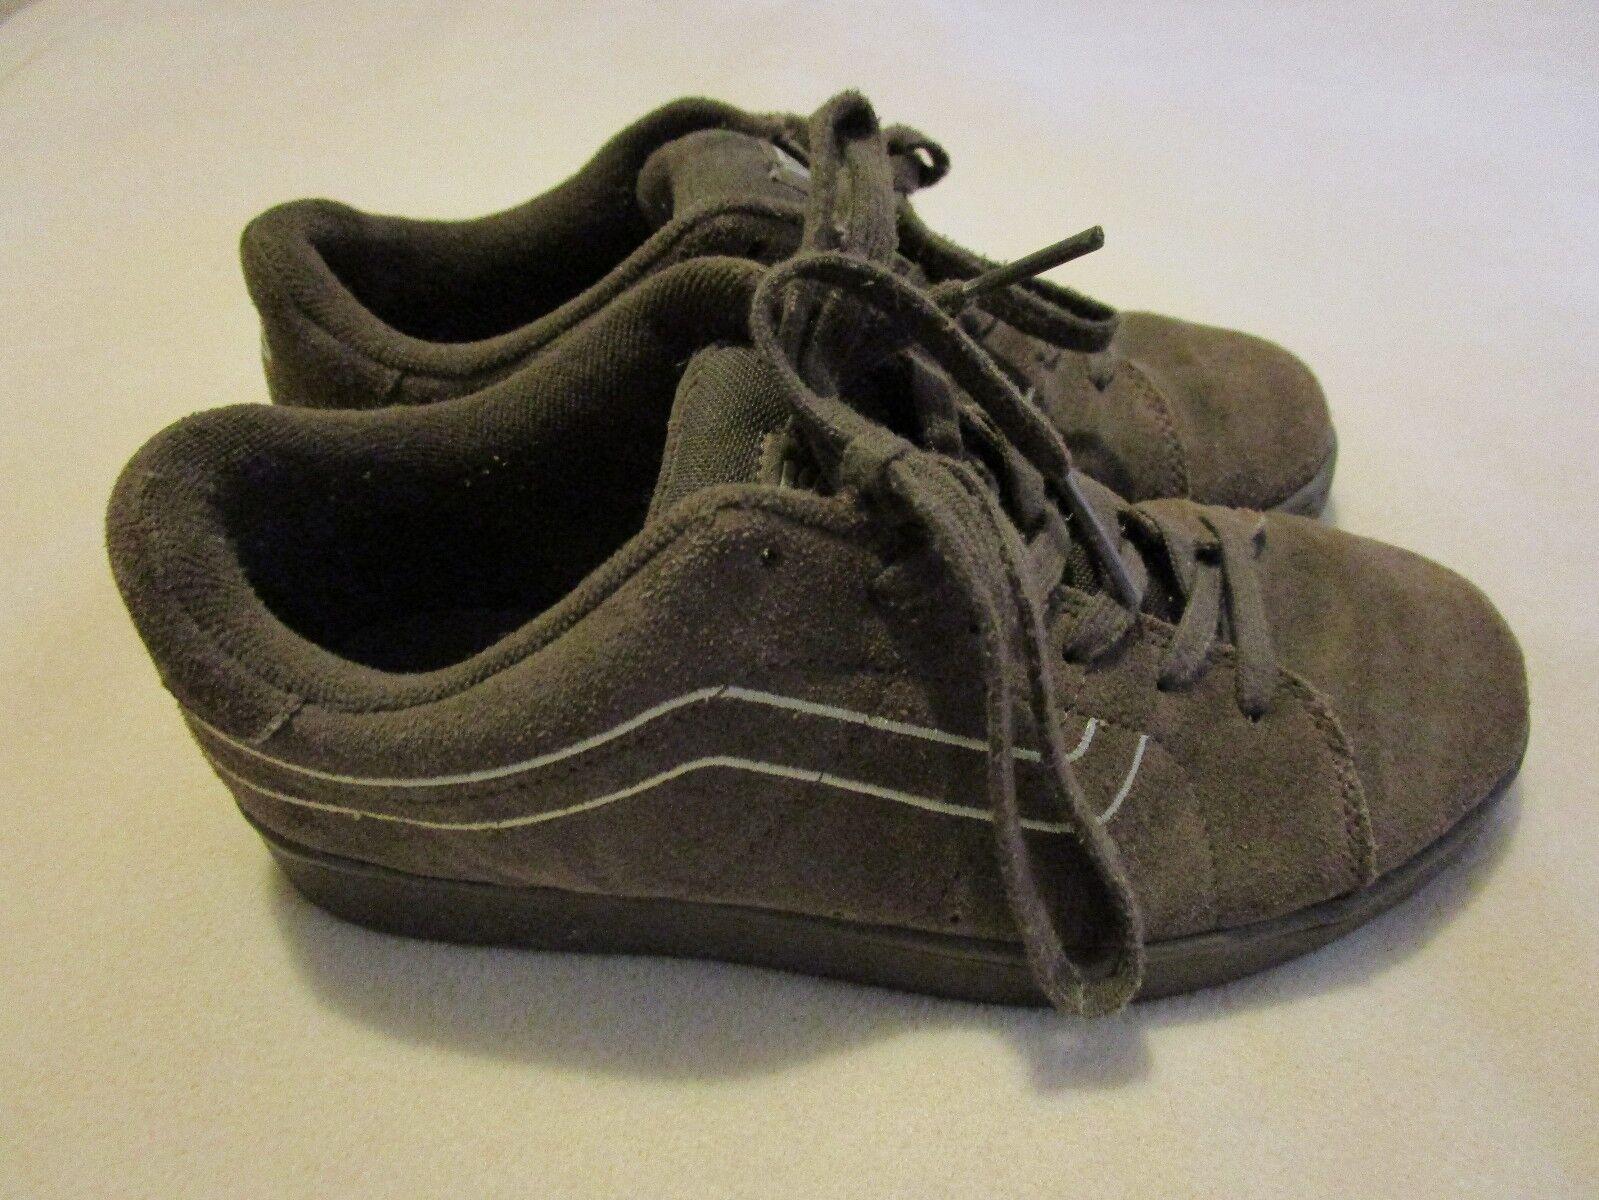 Vintage Nike Air Bohemian City Navy *DAMAGED* Metallic Trainers US 10 *DAMAGED* Navy 04f751